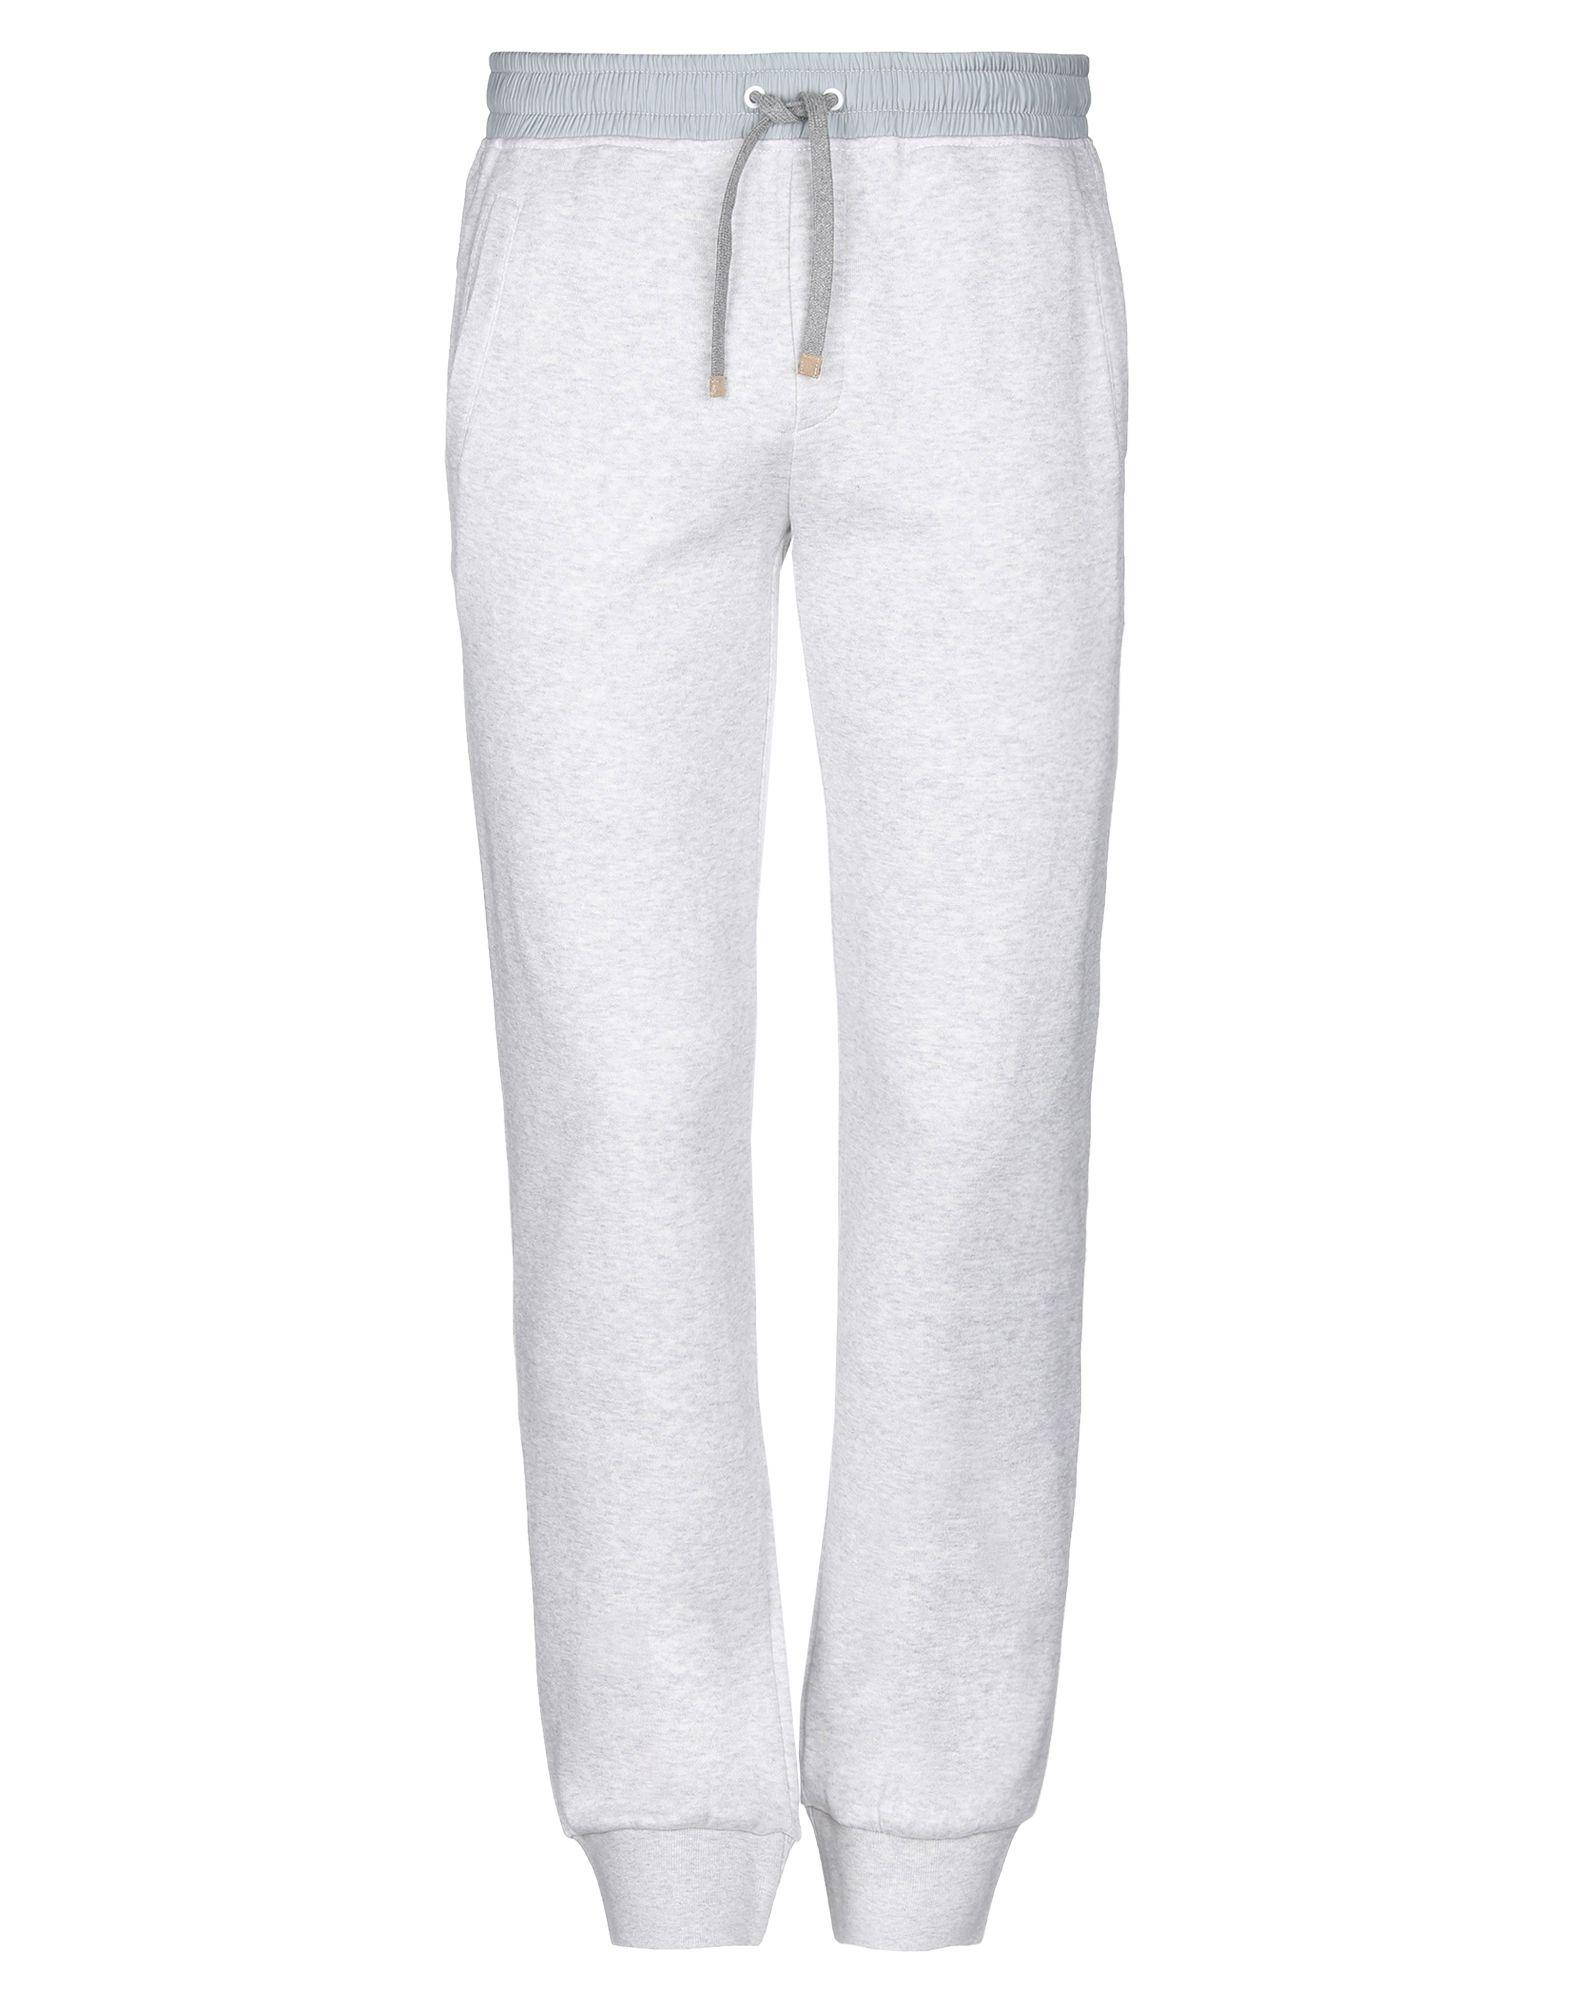 Pantalone Pantalone Pantalone Eleventy uomo - 13377203QU c00